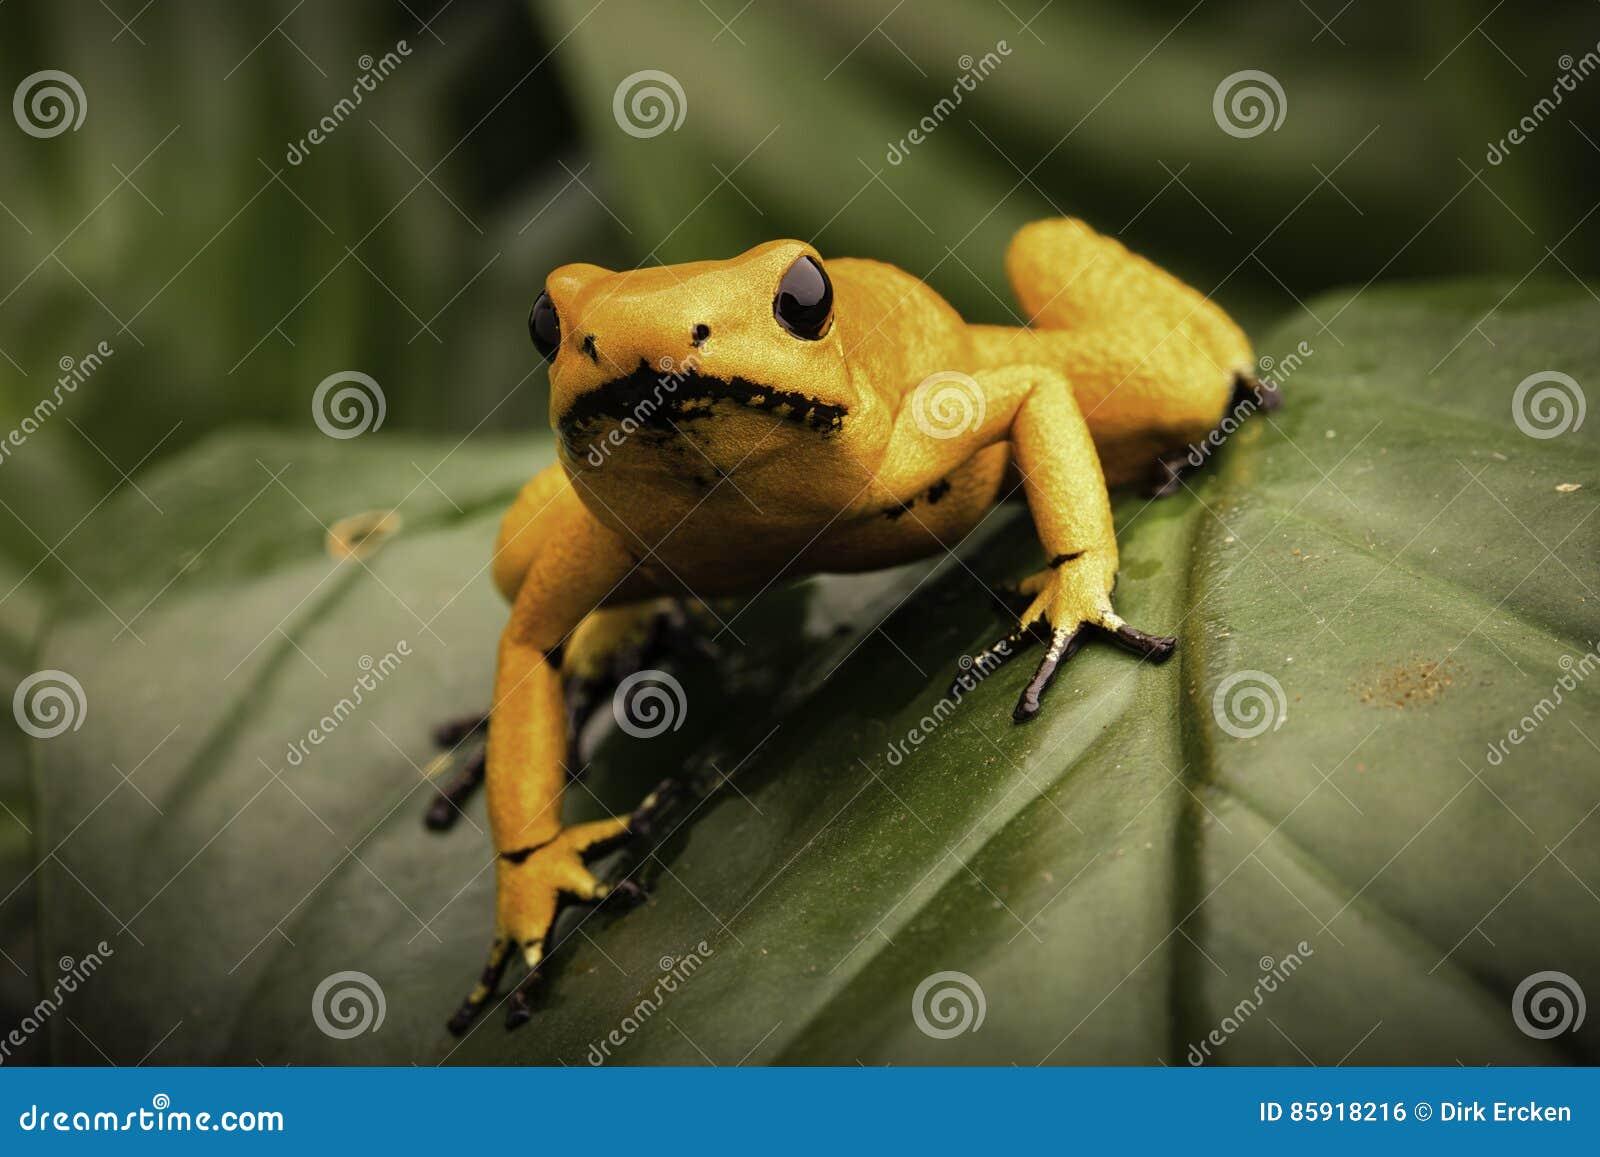 Most poisonous poison dart frog Phyllobates terribilis